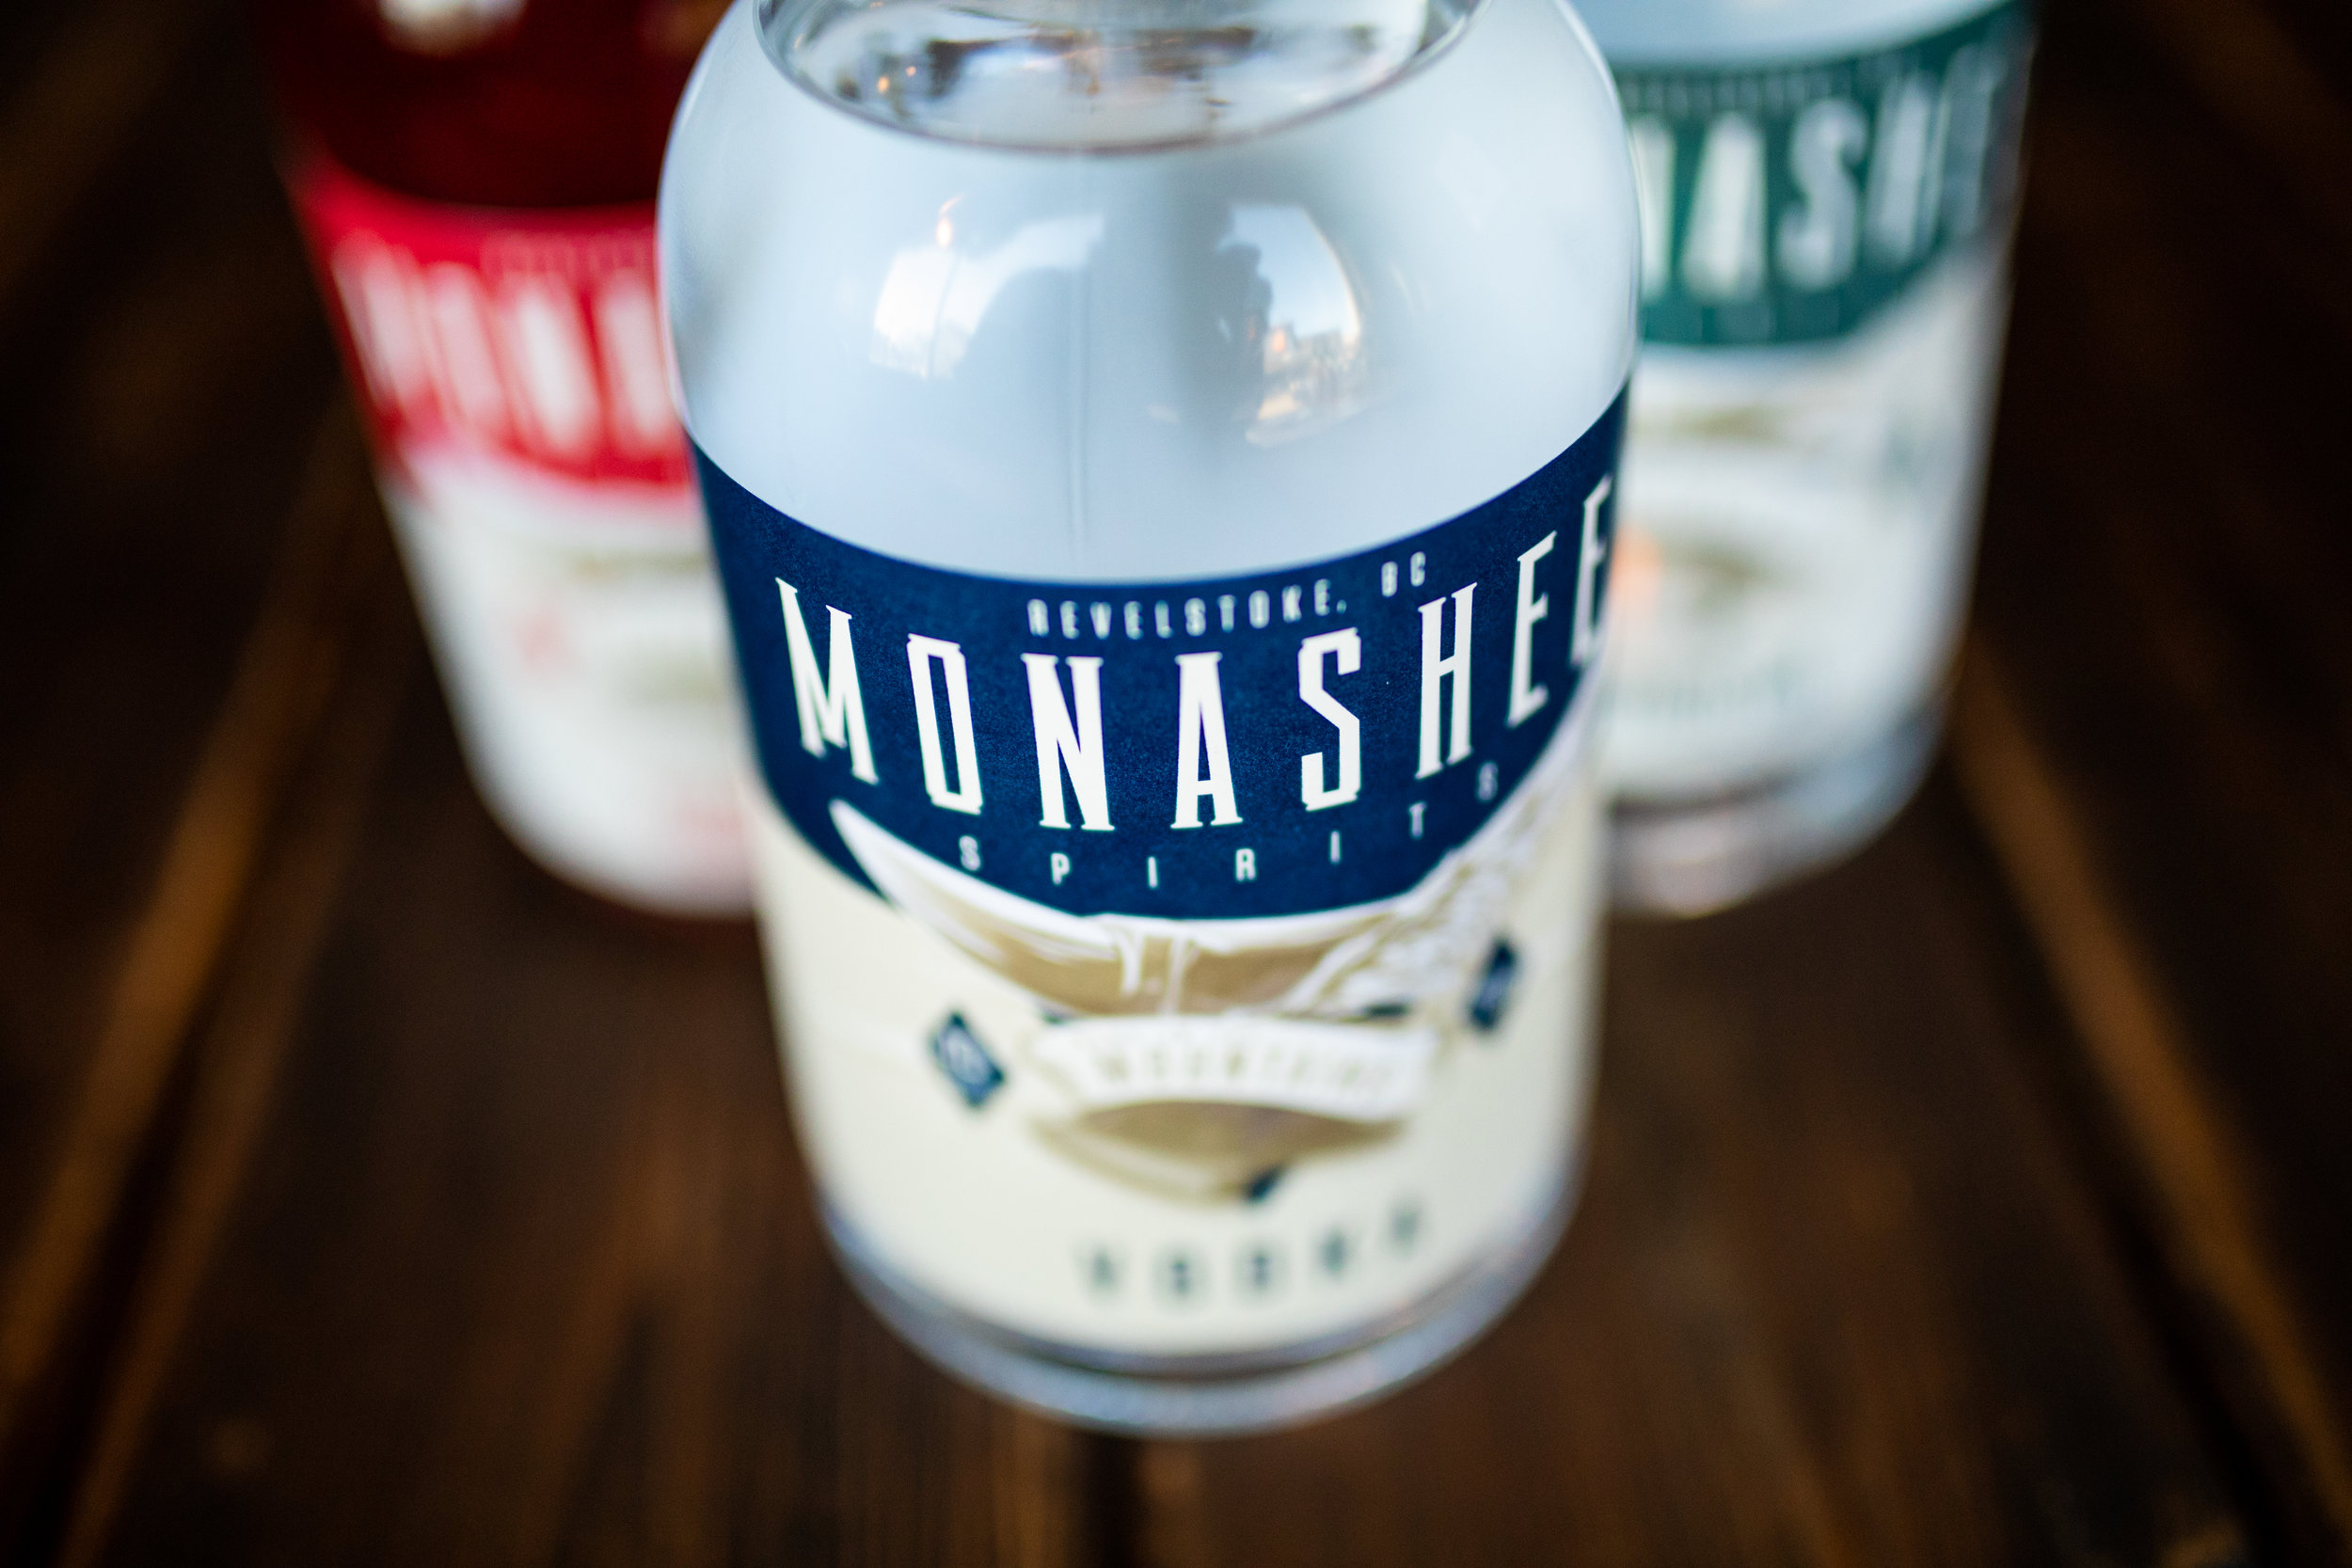 Cole Hofstra - http---www.colehofstra.com - Cole Hofstra Photography - Monashee distilling - Revelsroke Distilling - Monashee-53.jpg